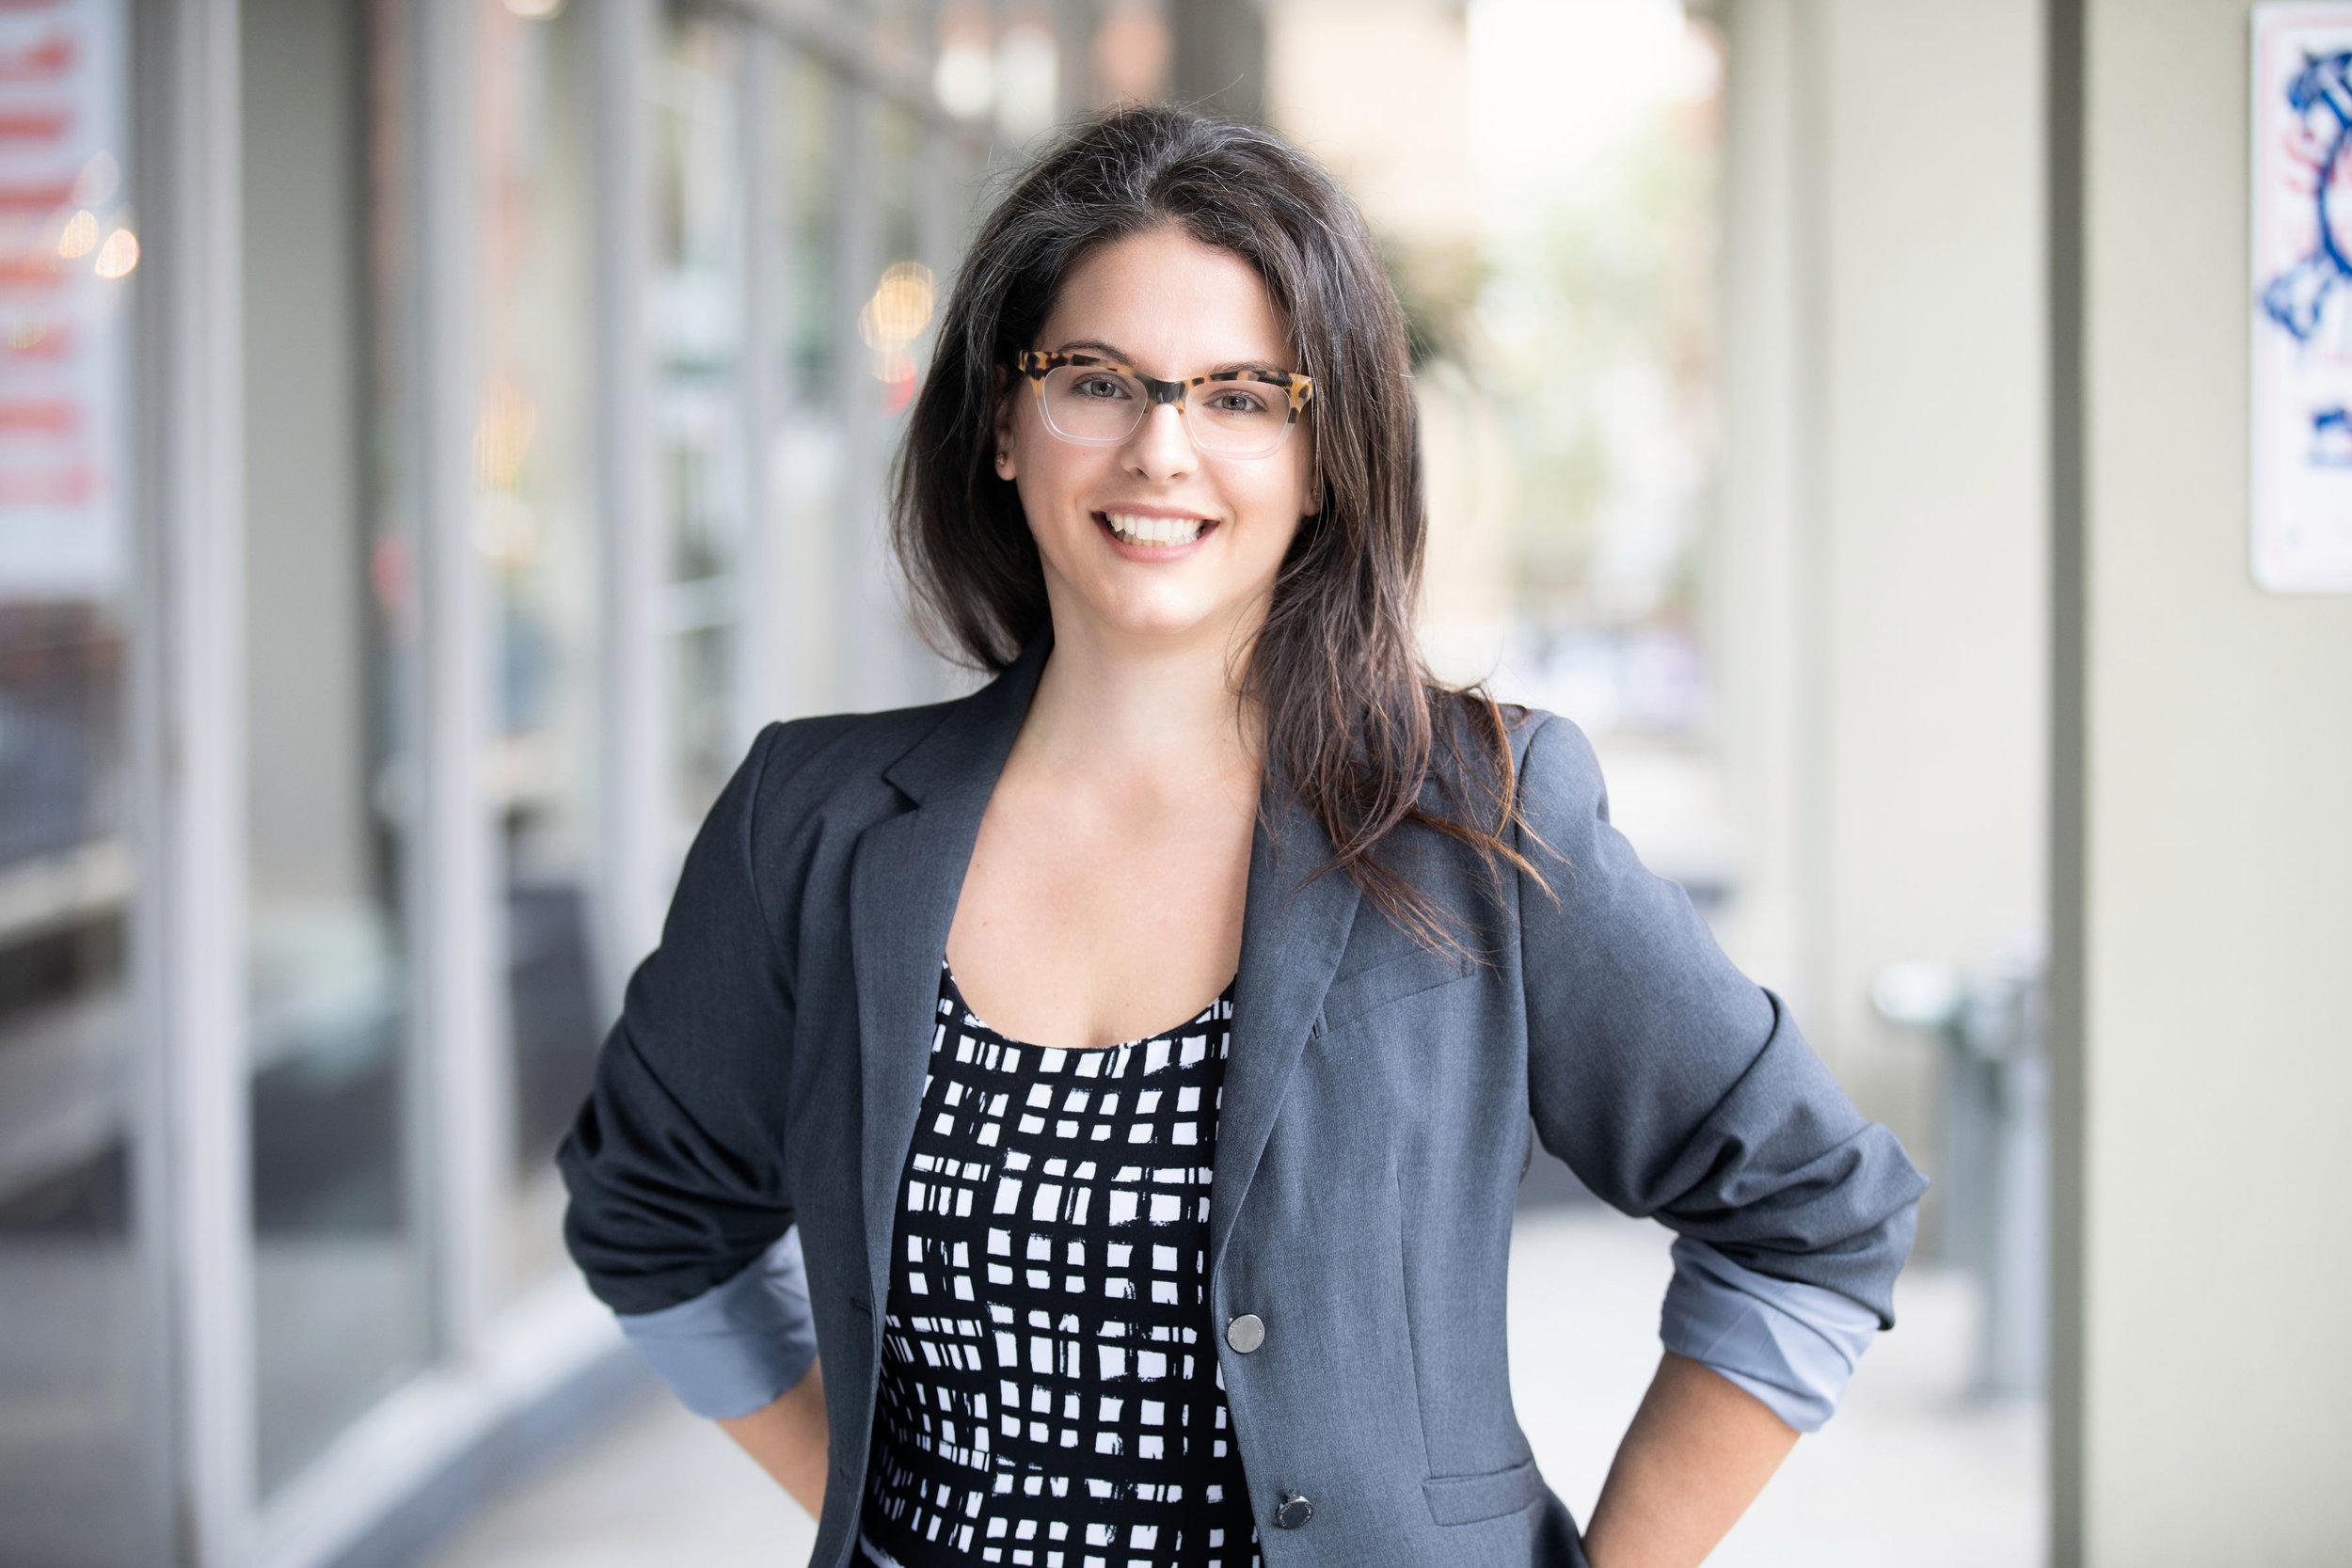 Chrissy macken, founder, blueprintgreen Career Coaching & Consulting